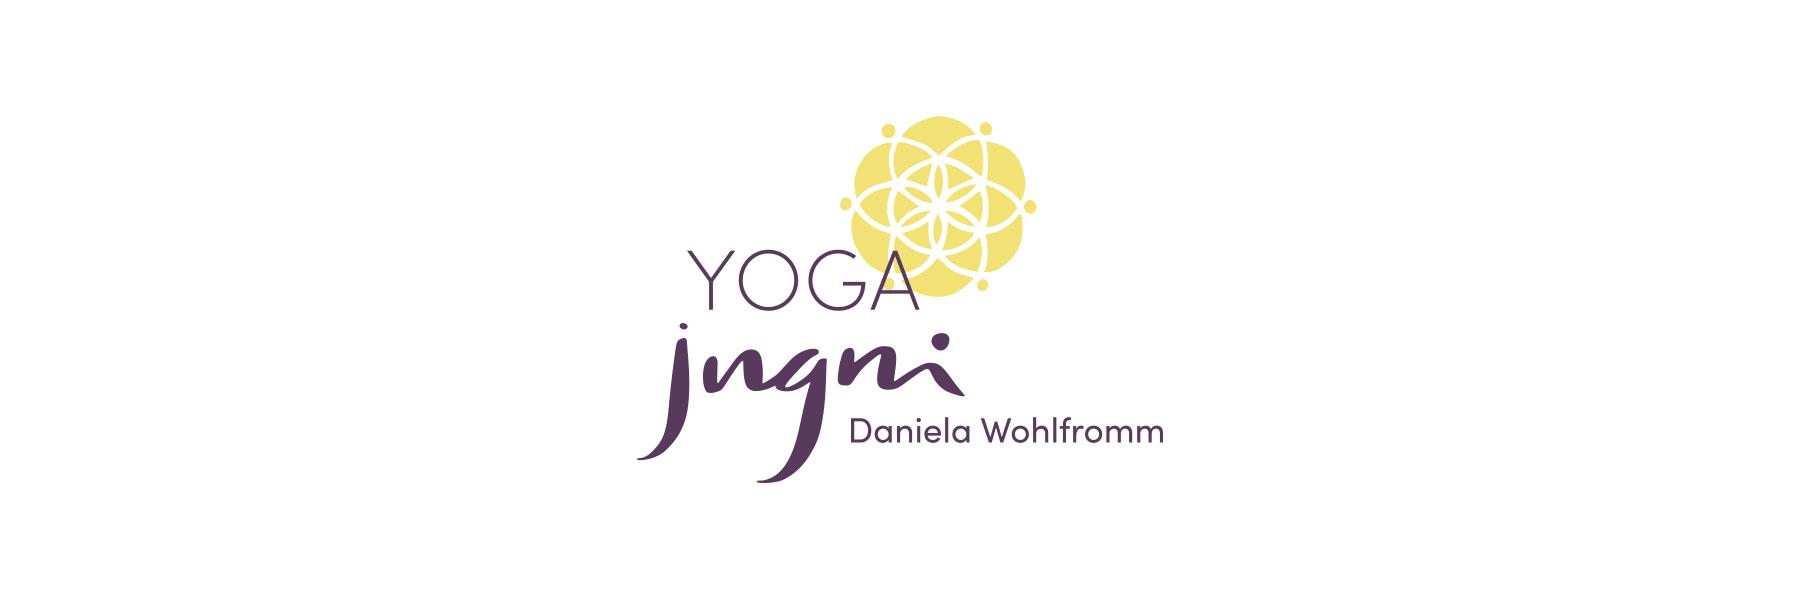 Atilde-Design-Yoga-Jugni-weiss